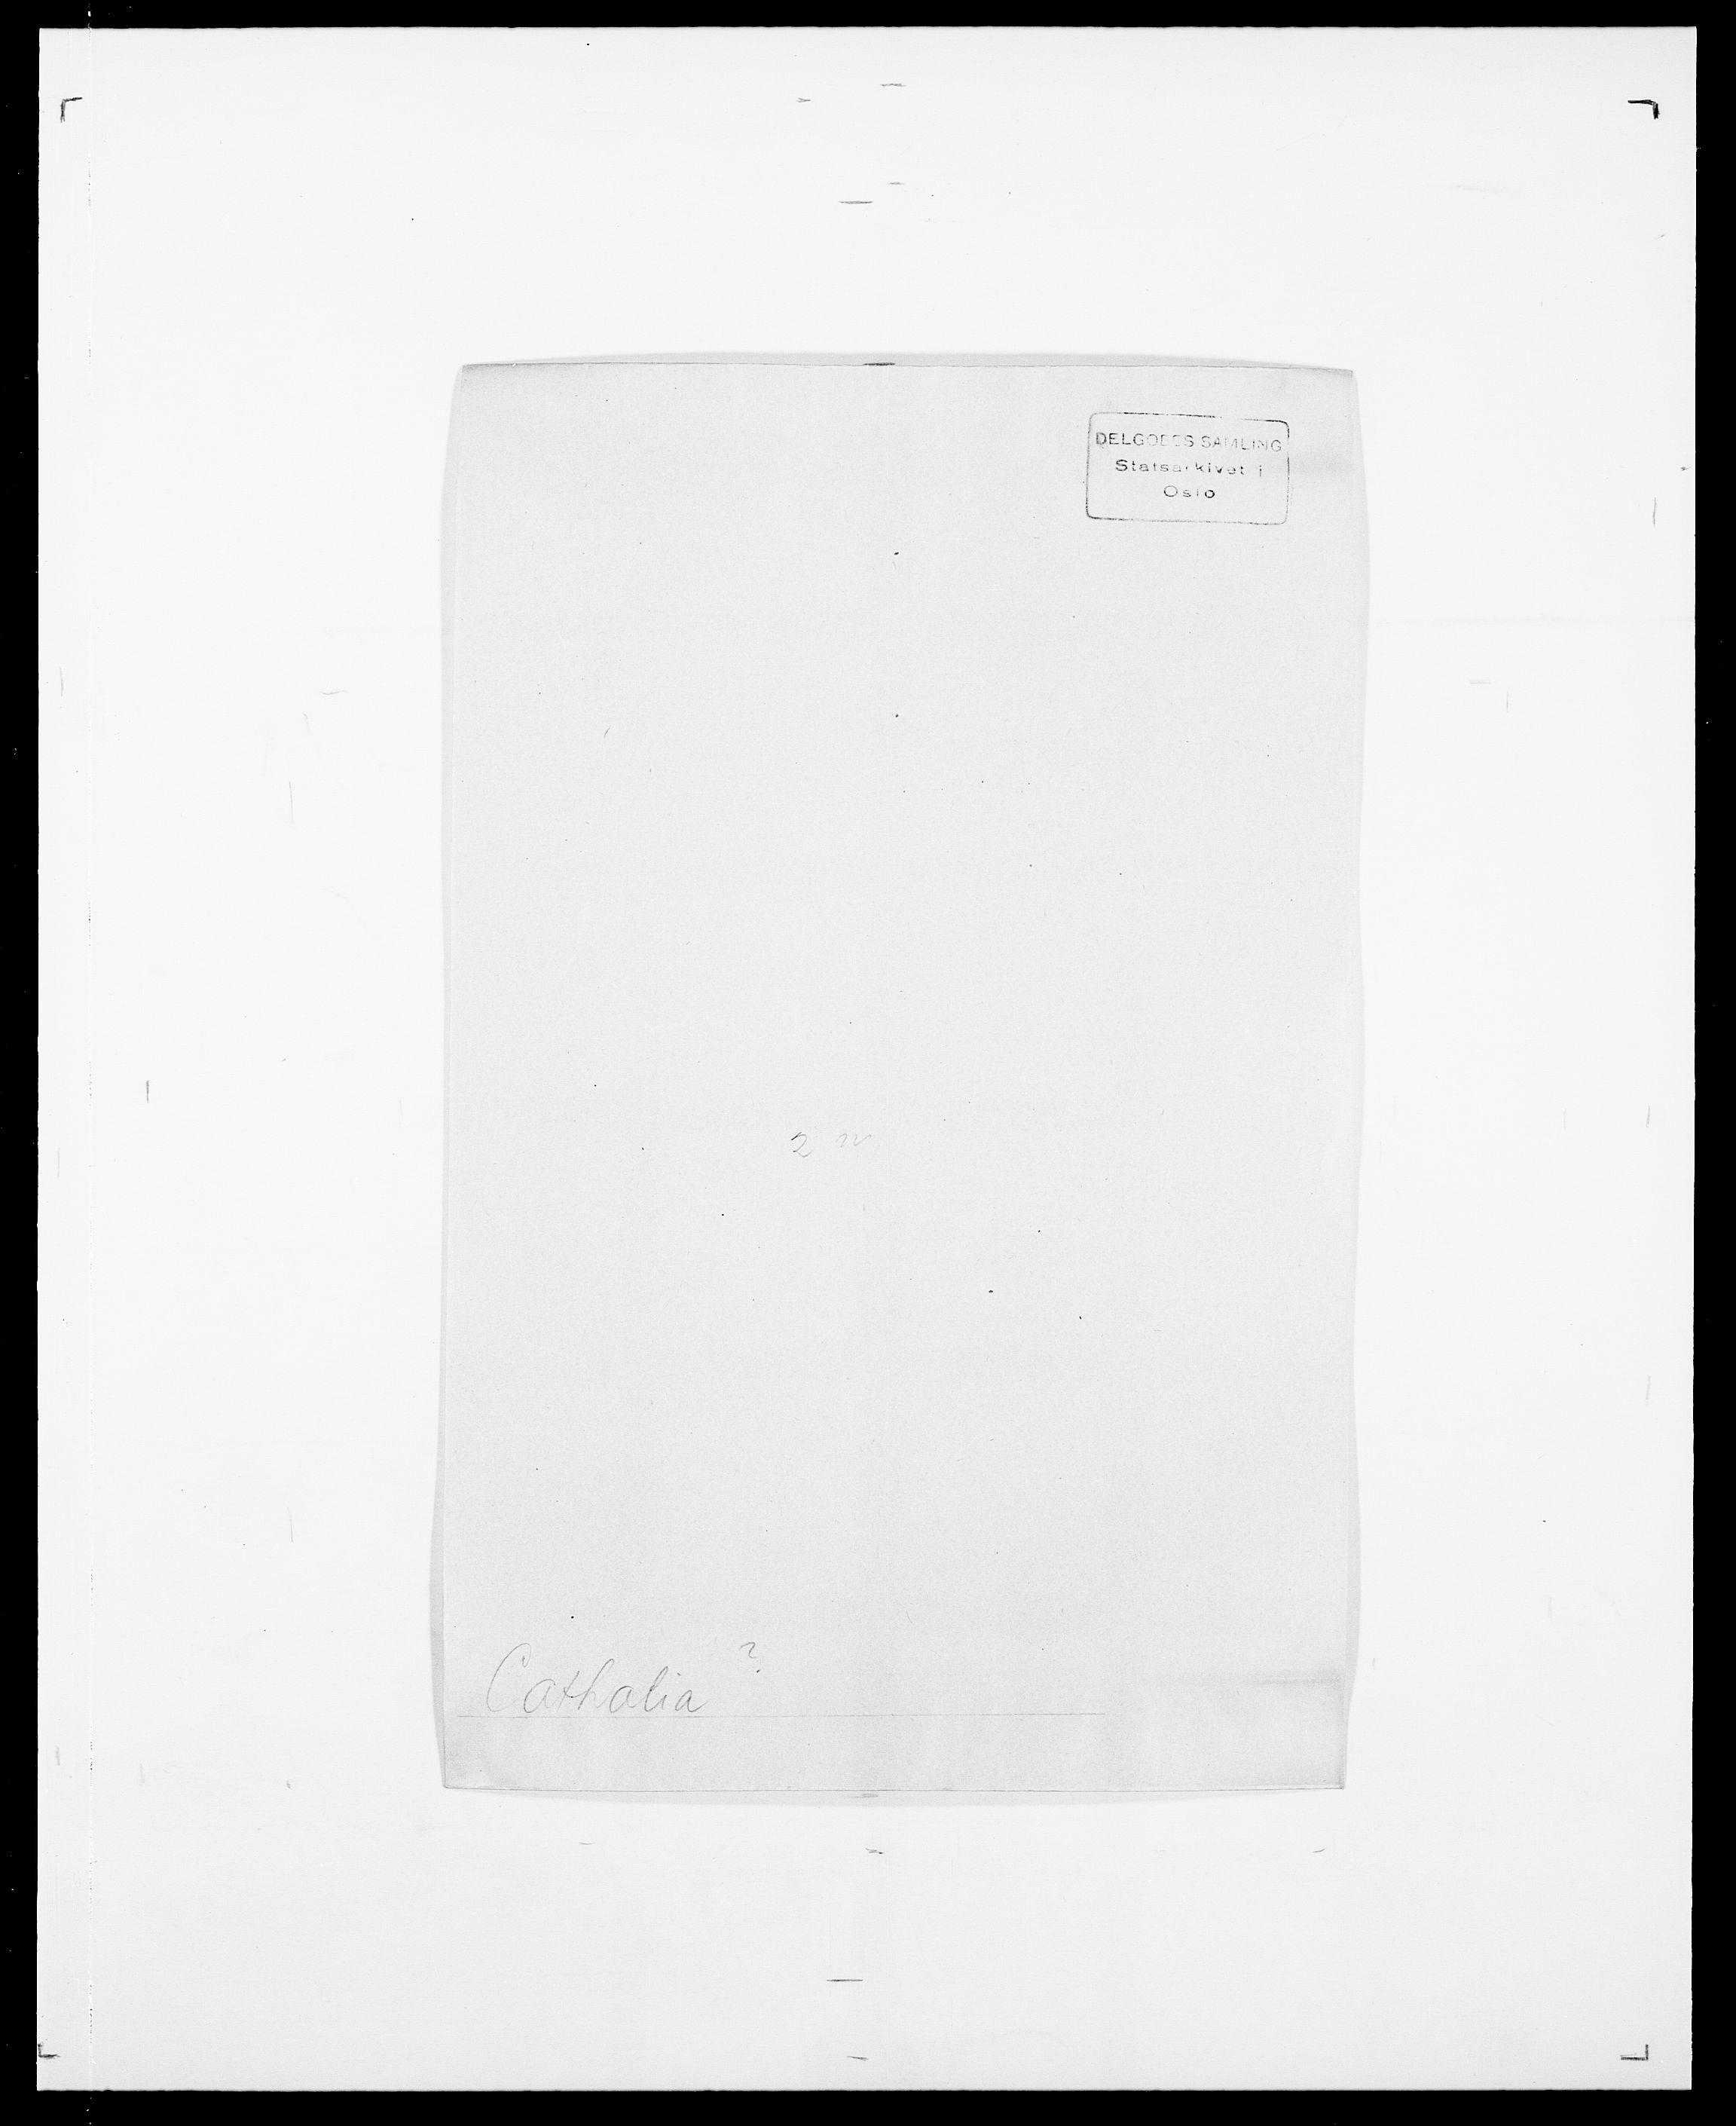 SAO, Delgobe, Charles Antoine - samling, D/Da/L0008: Capjon - Dagenbolt, s. 154